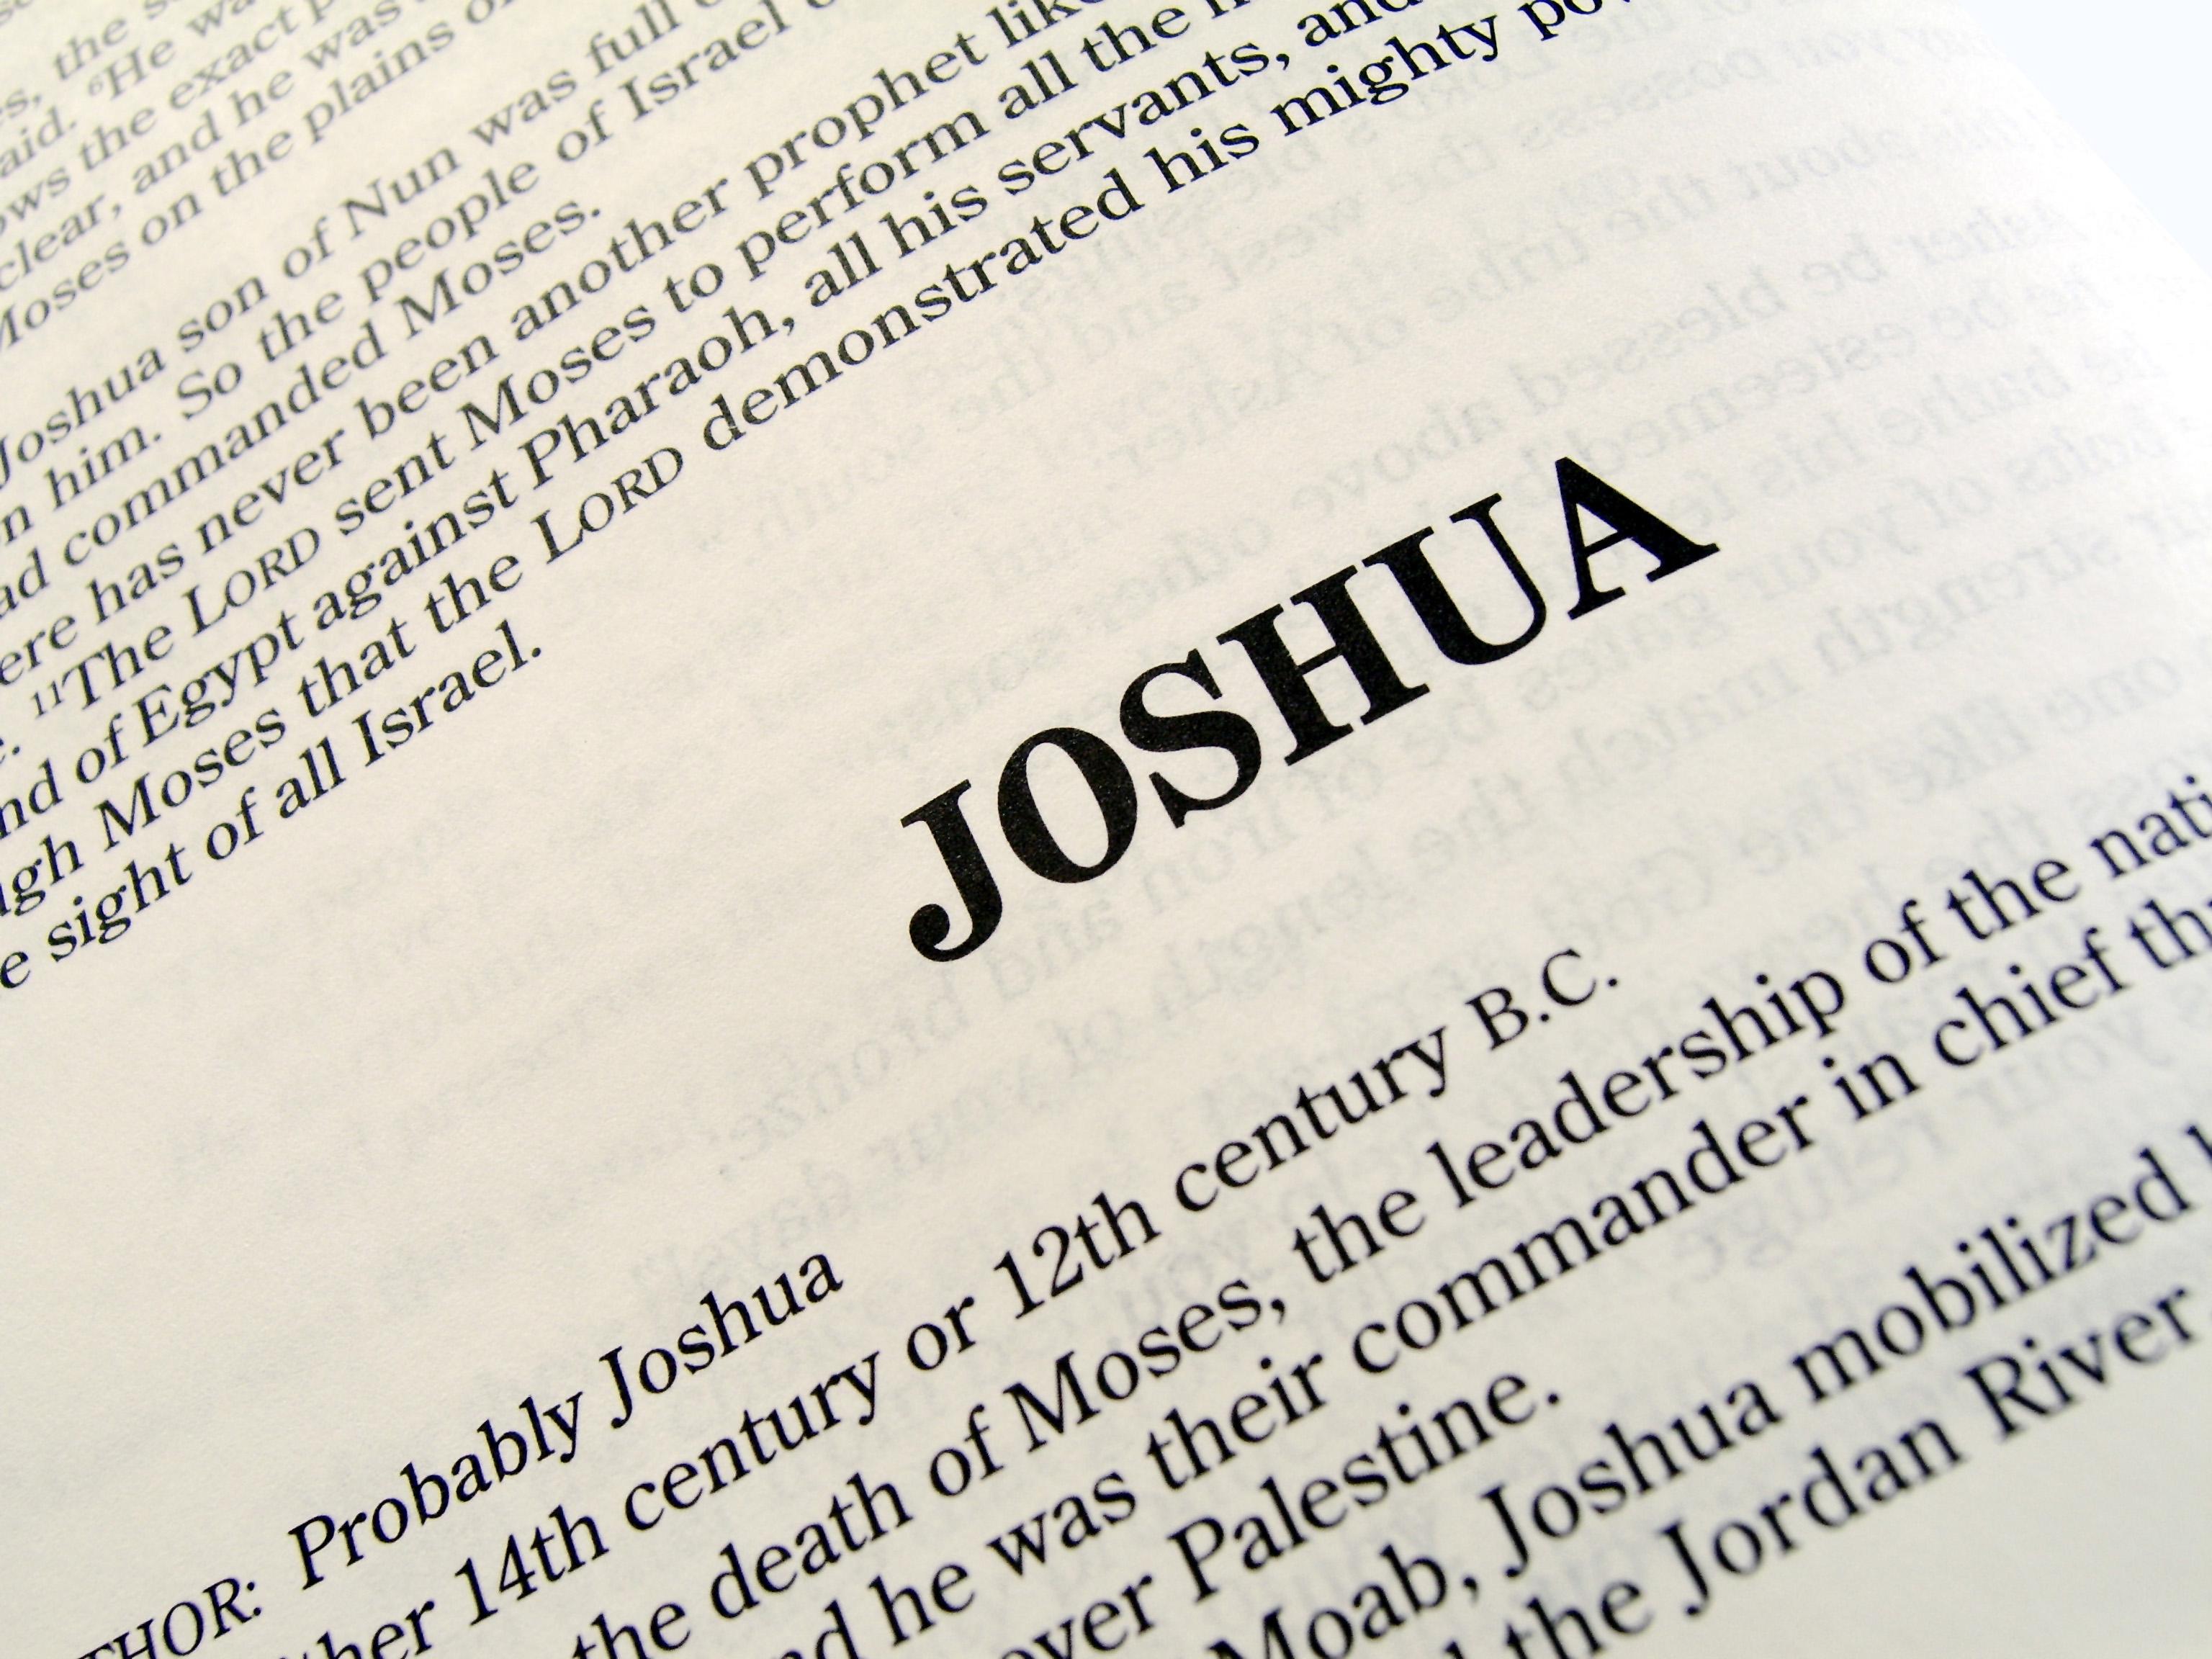 Joshua-Wayne Barber